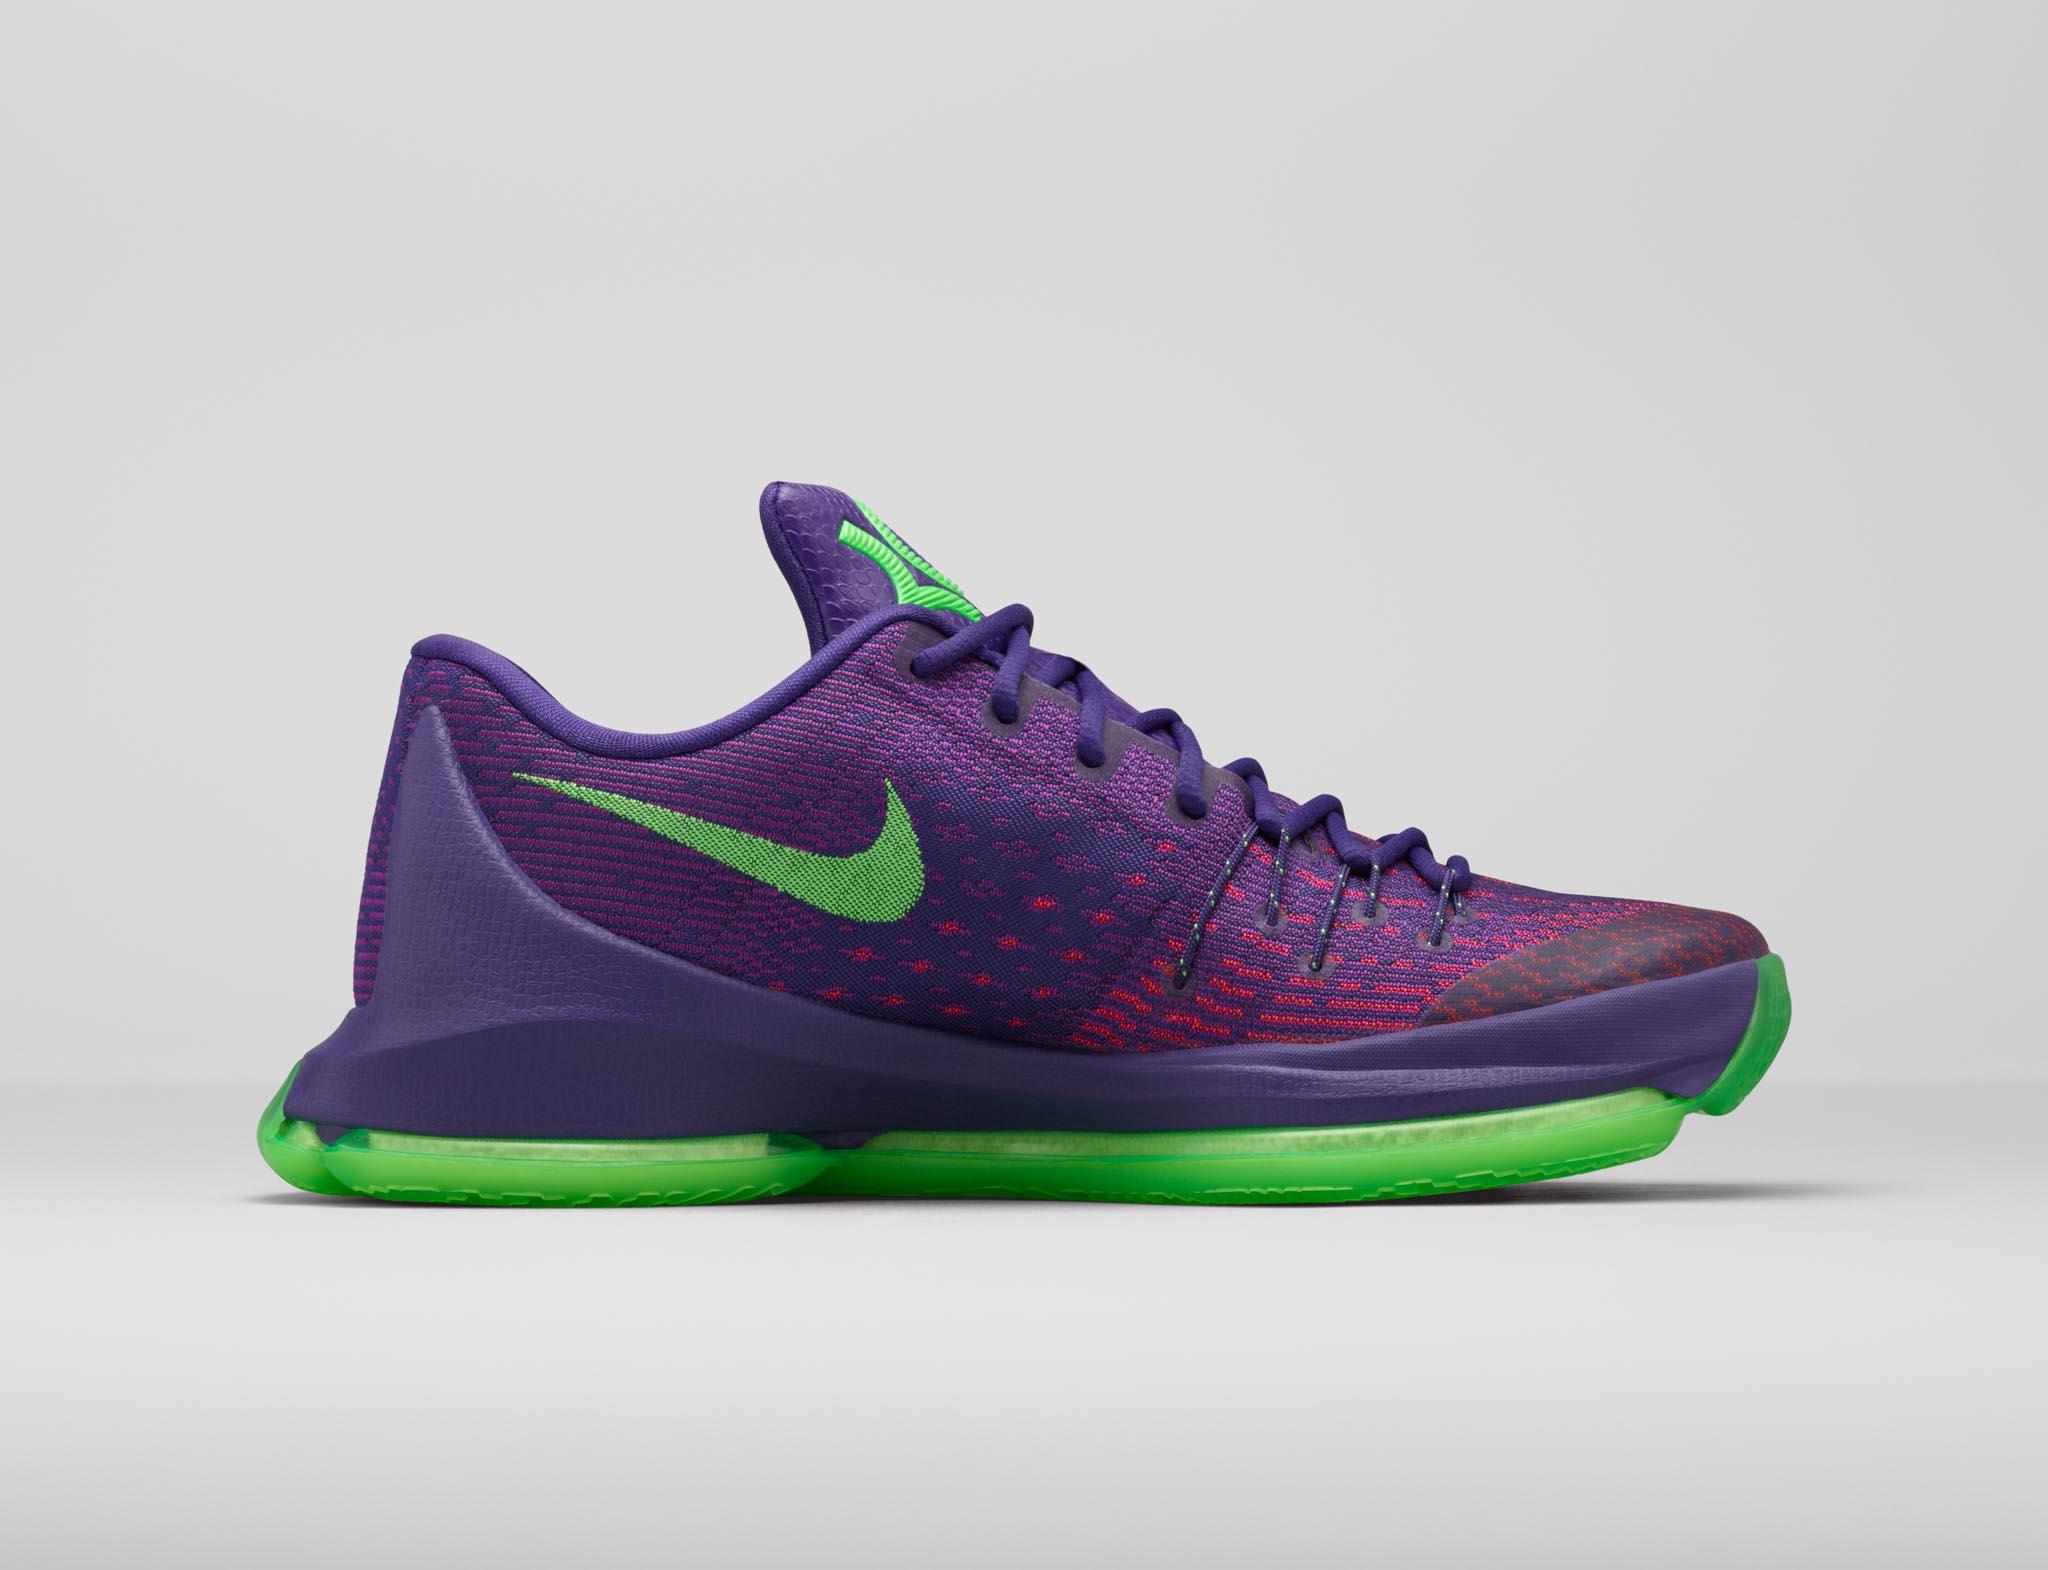 Nike Kd Mvp Shoes